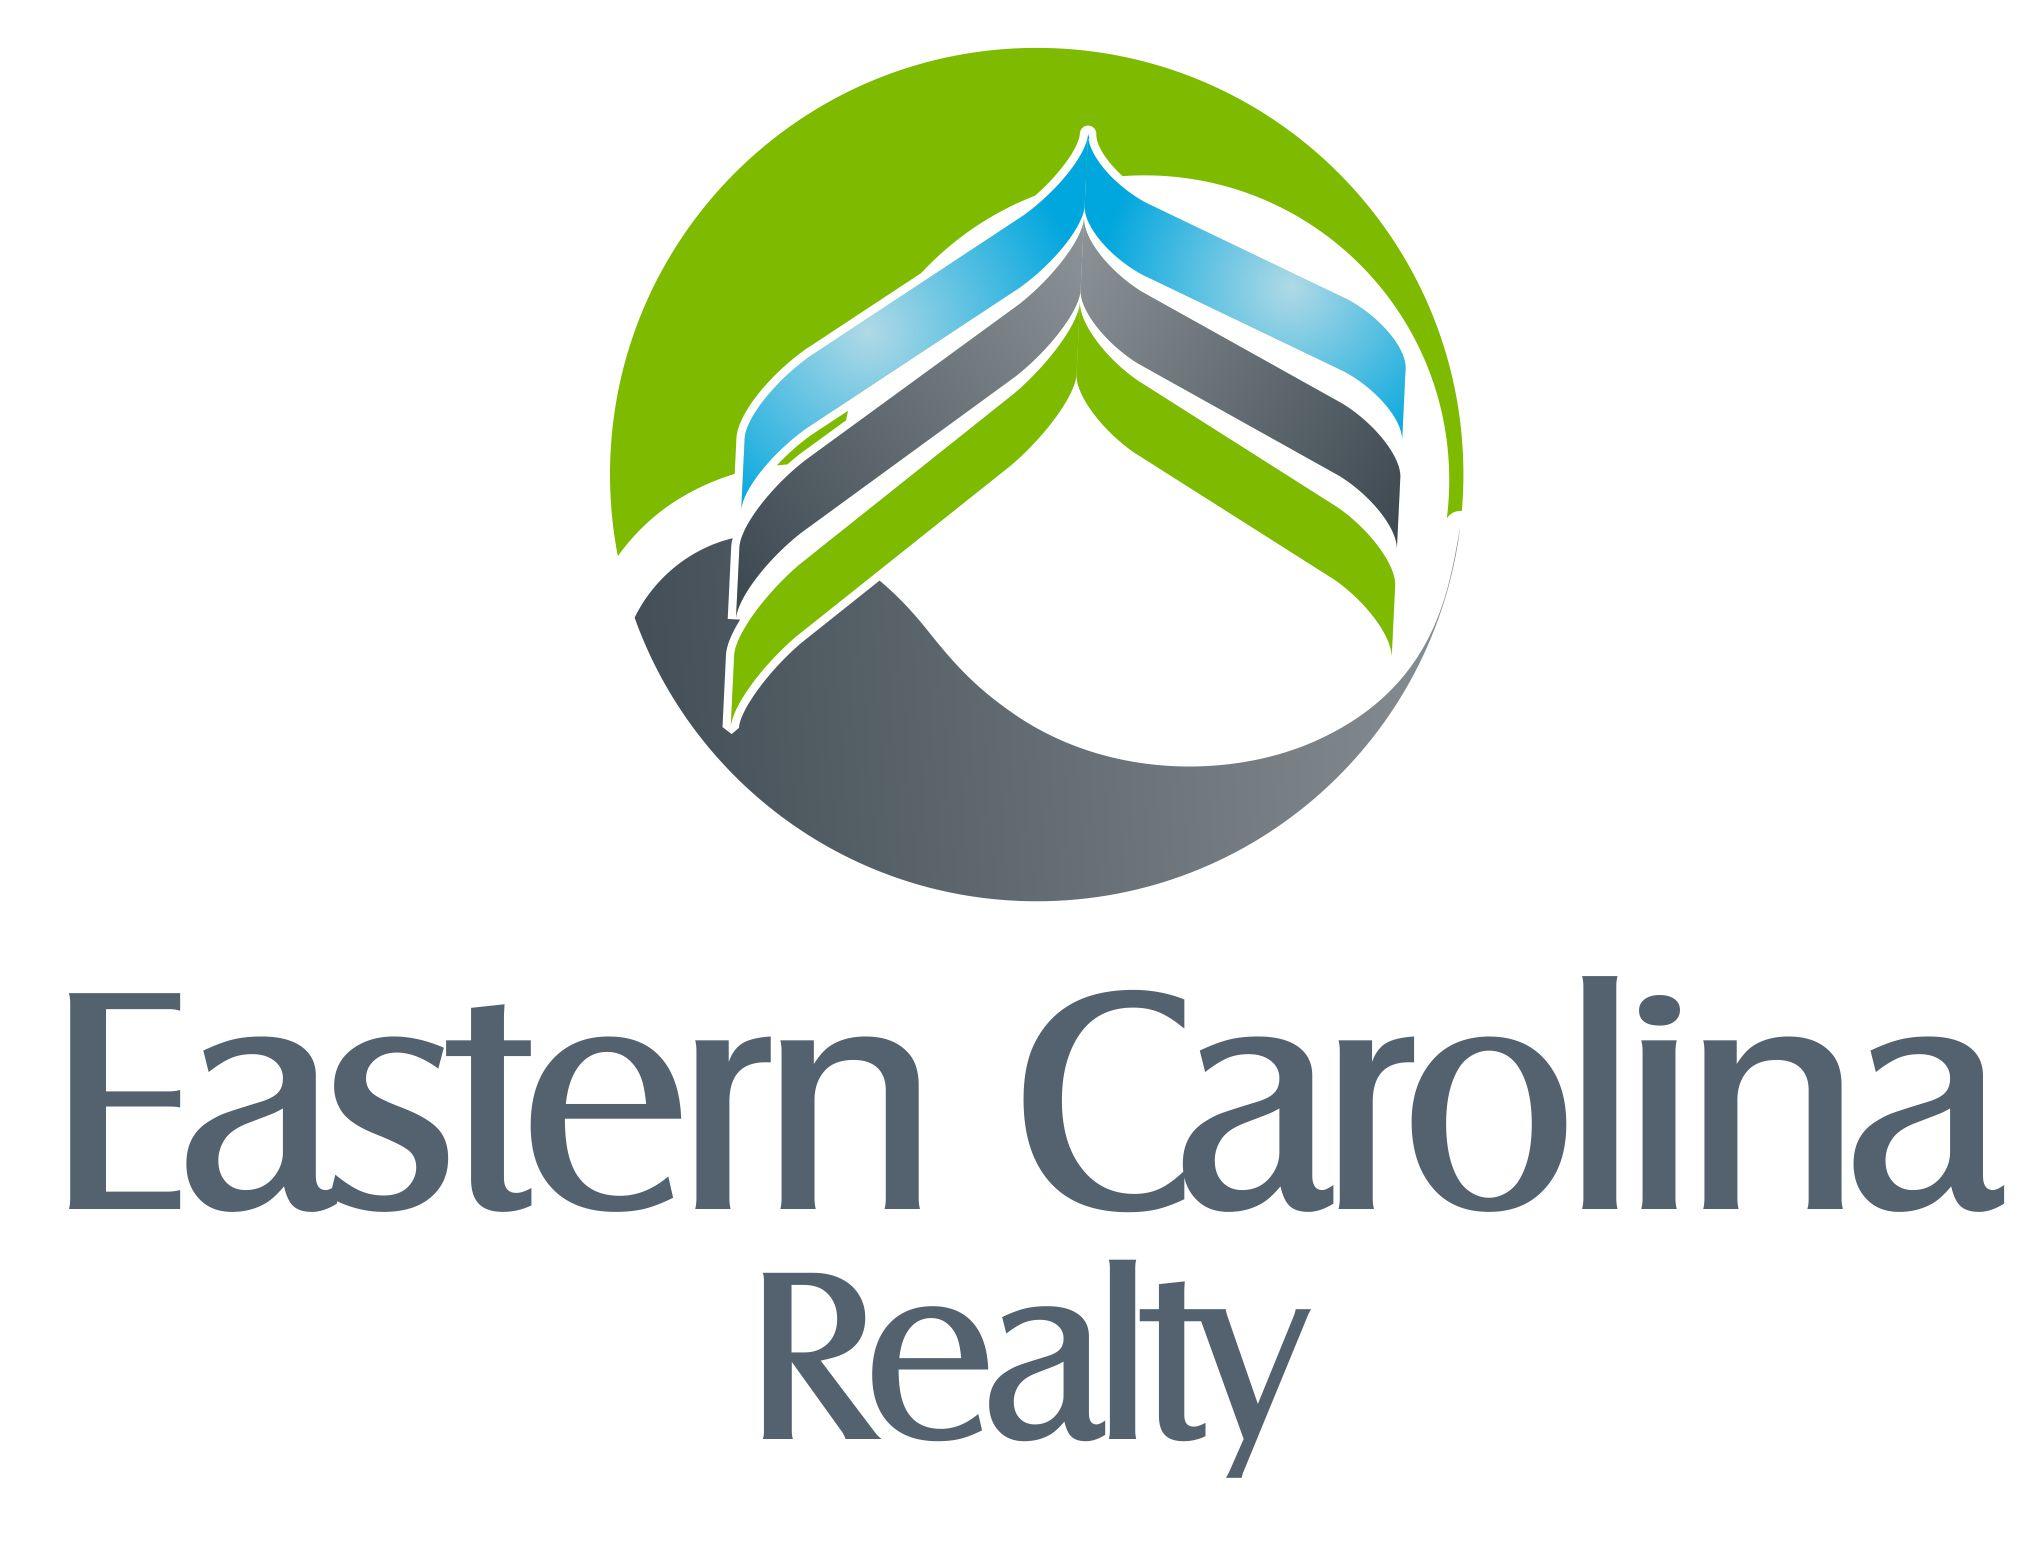 Patrick Watson - Eastern Carolina Realty Logo